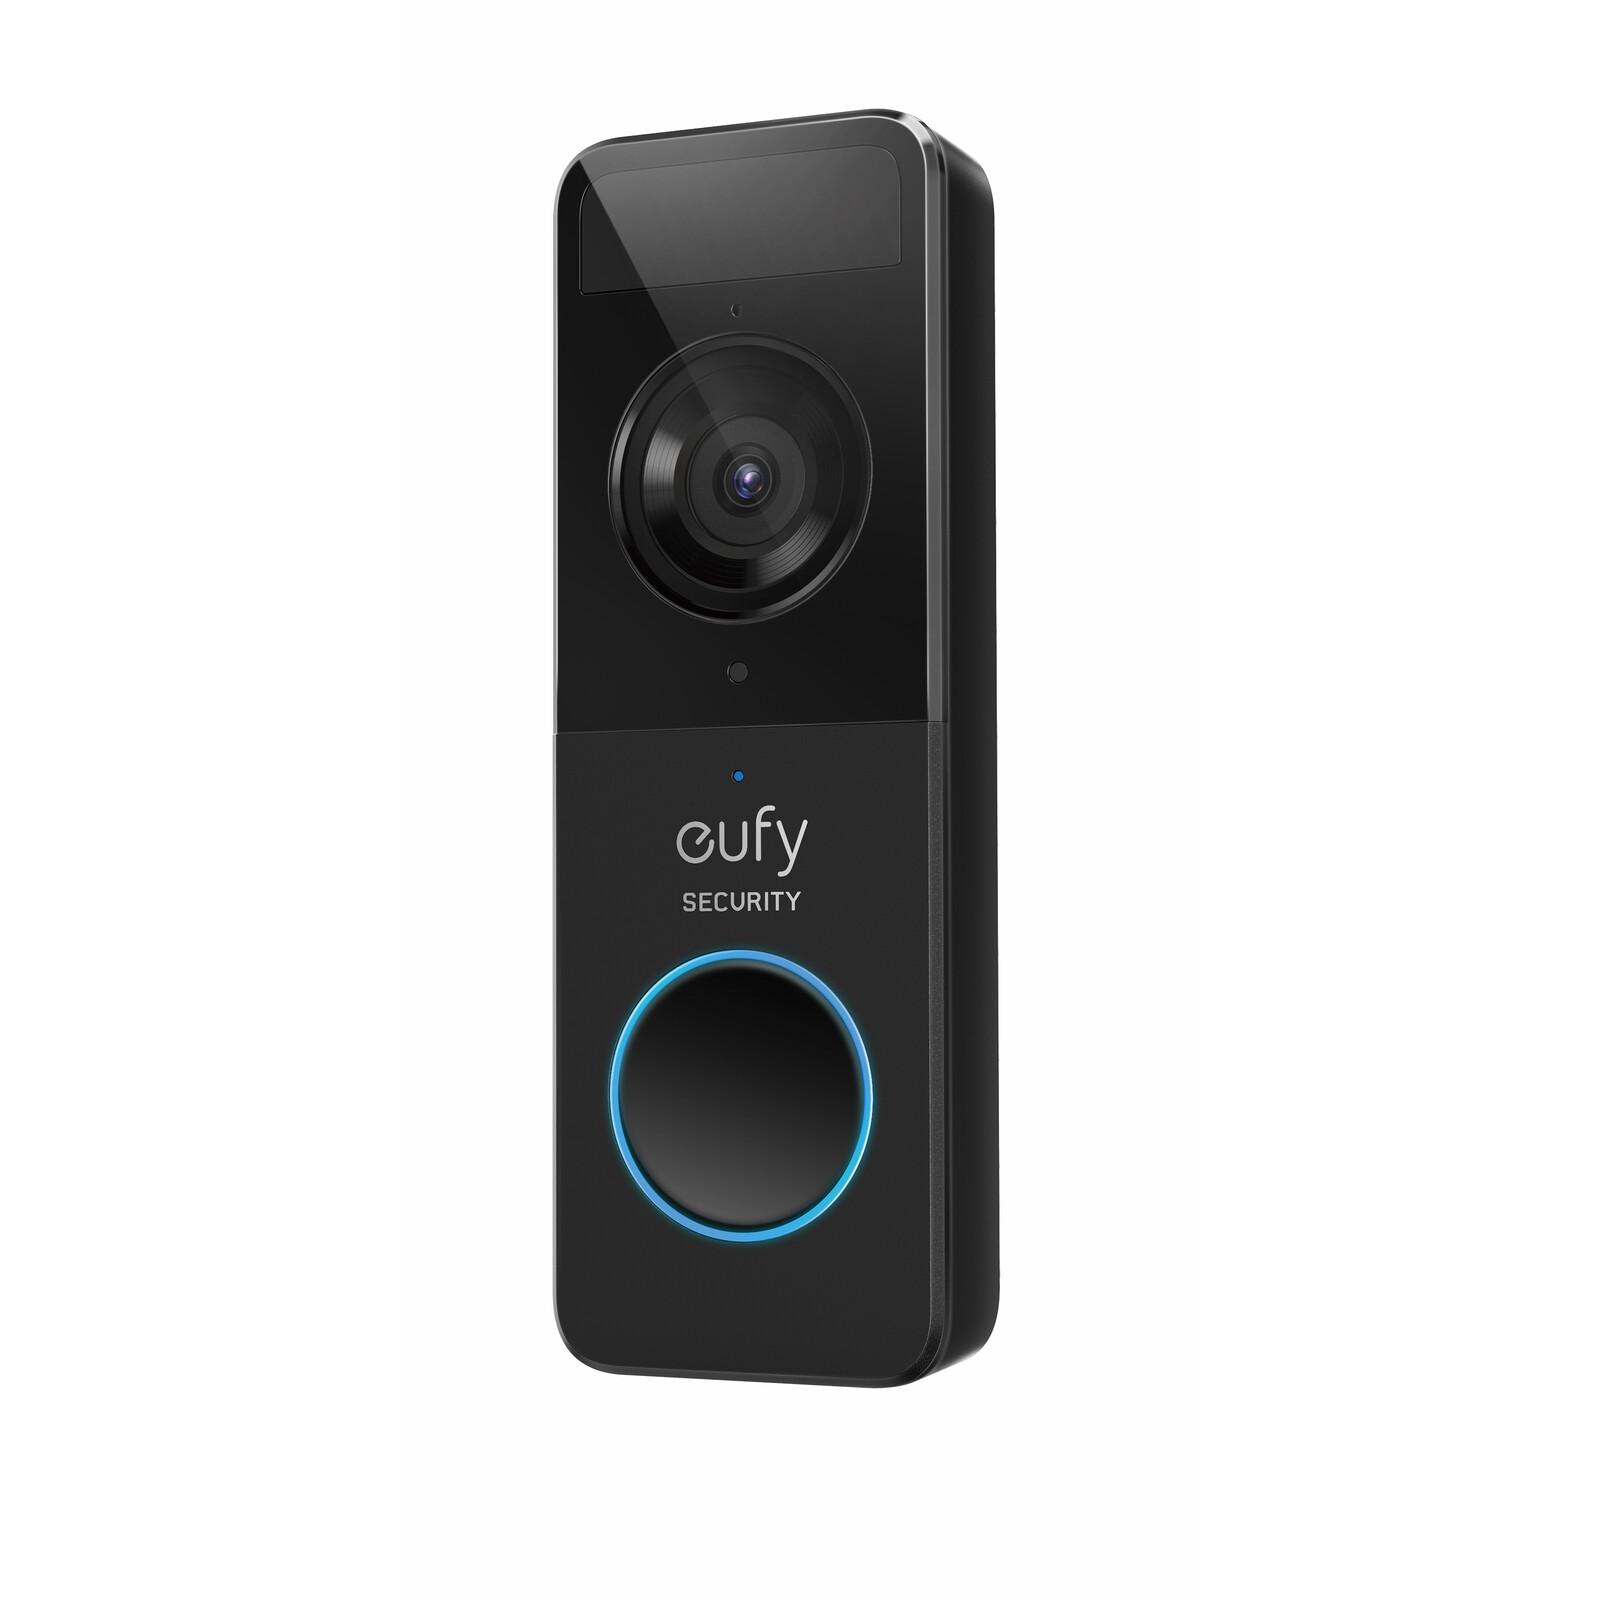 Eufy Battery Doorbell 1080p black